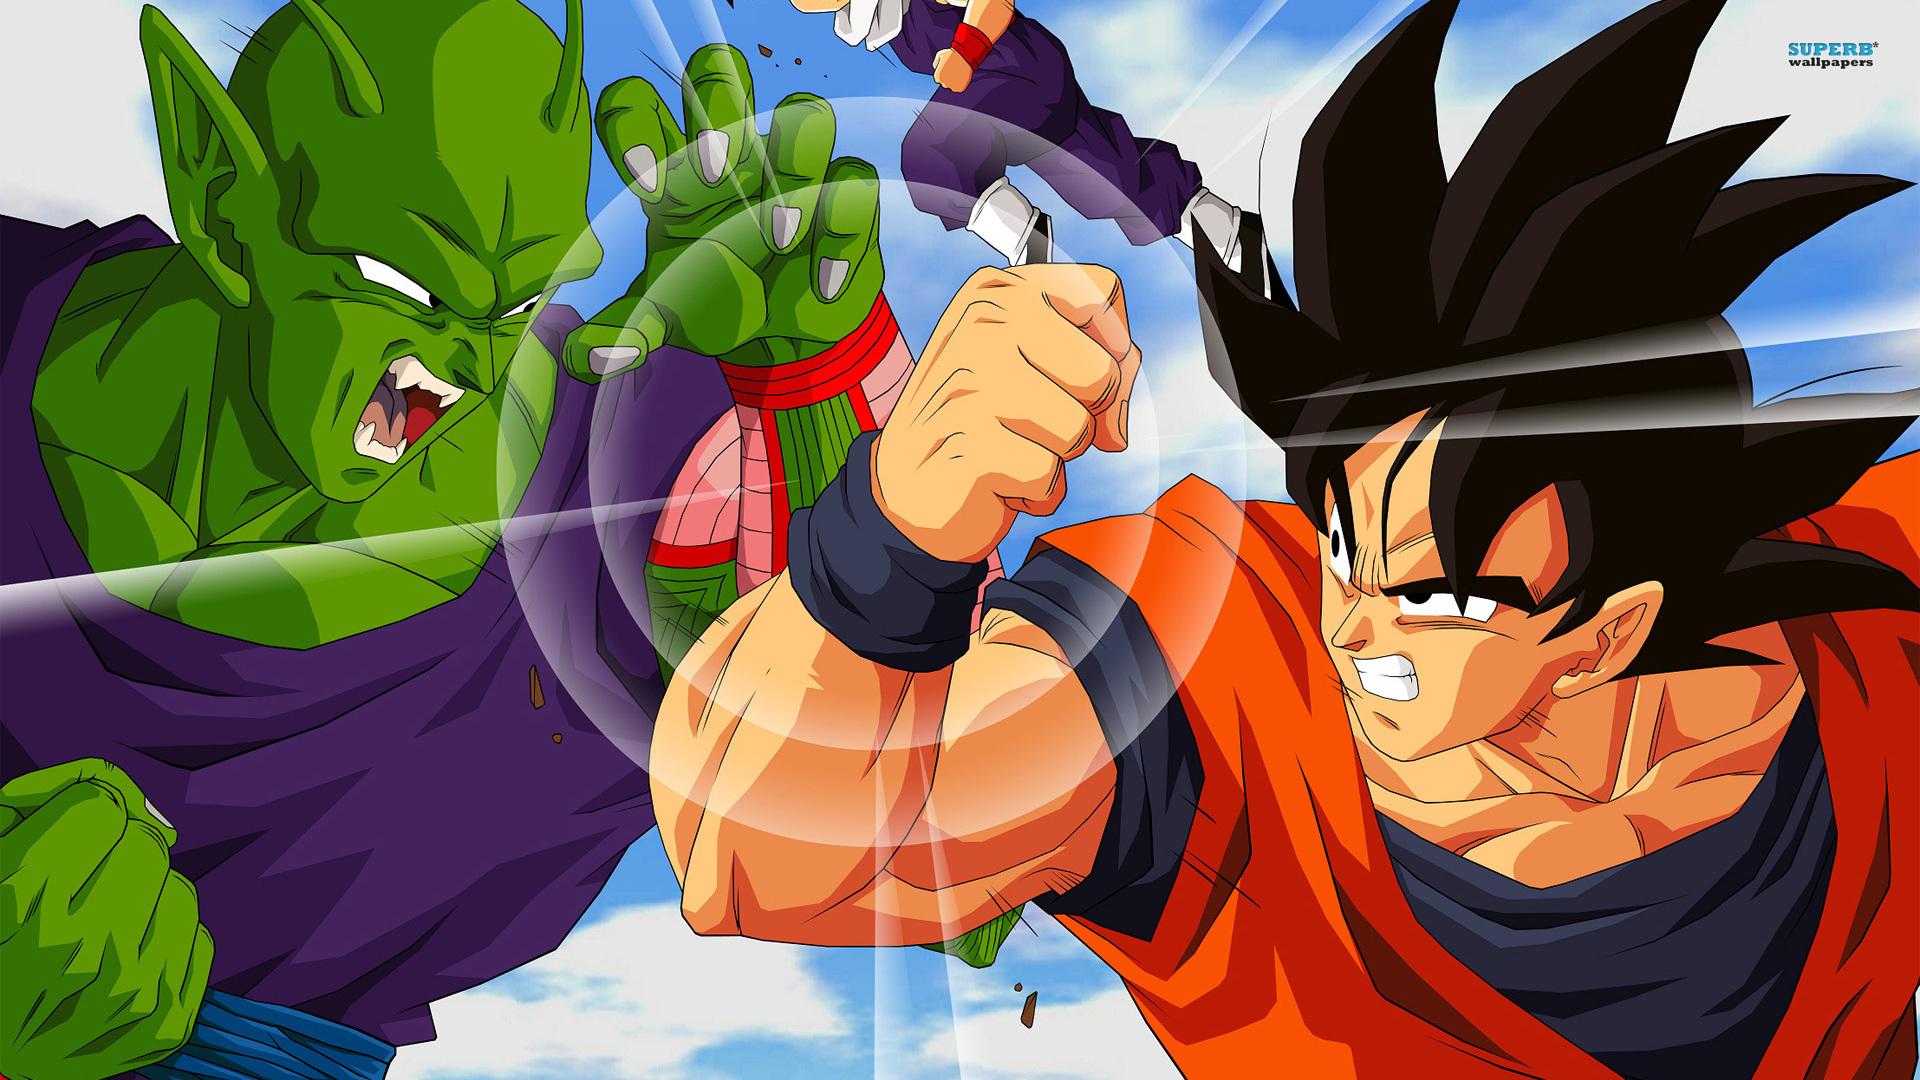 Free Download High Resolution Best Anime Dragon Ball Z Wallpaper